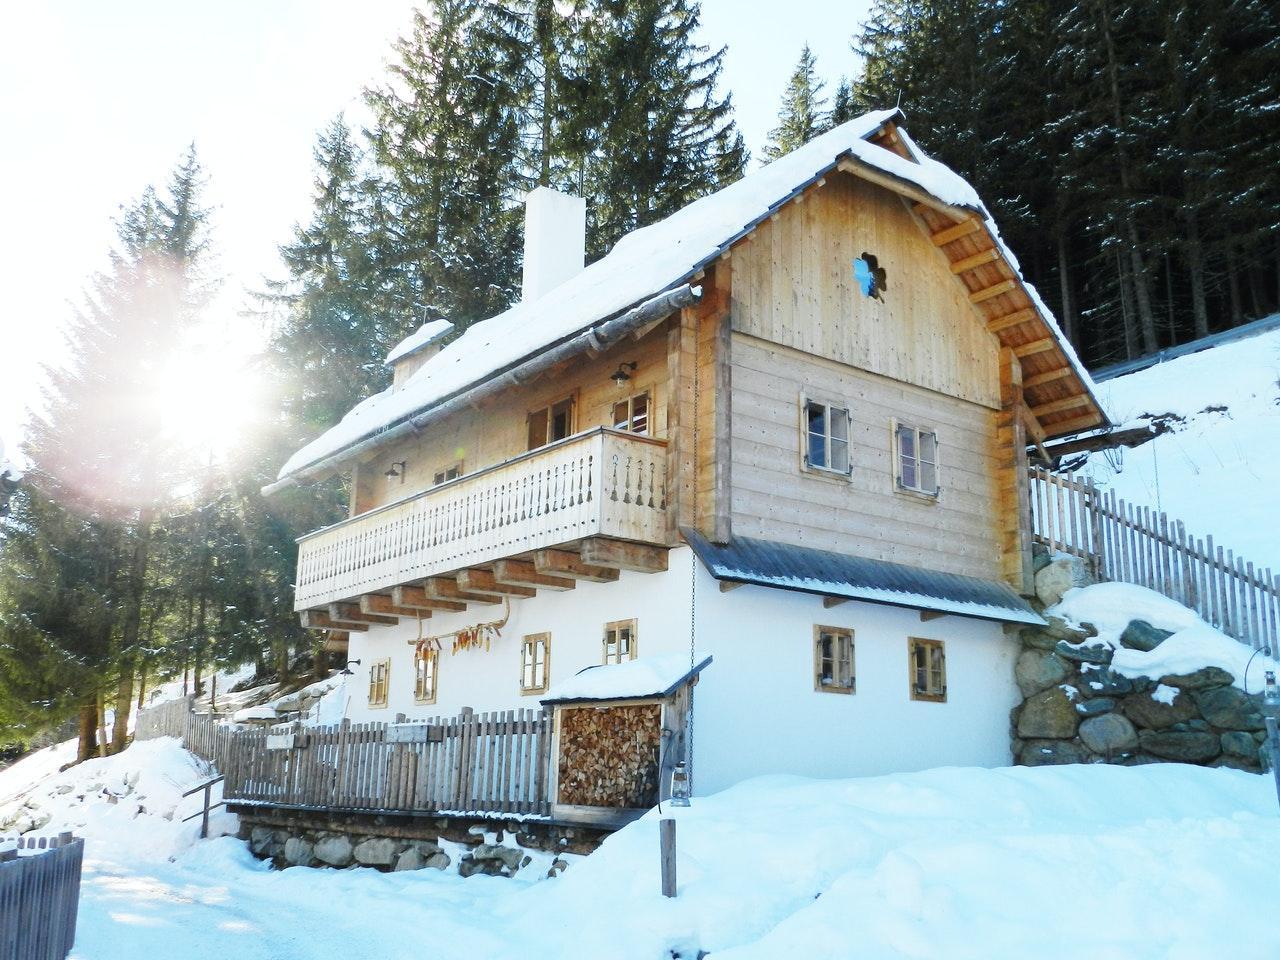 Ferienhütte in den Bergen